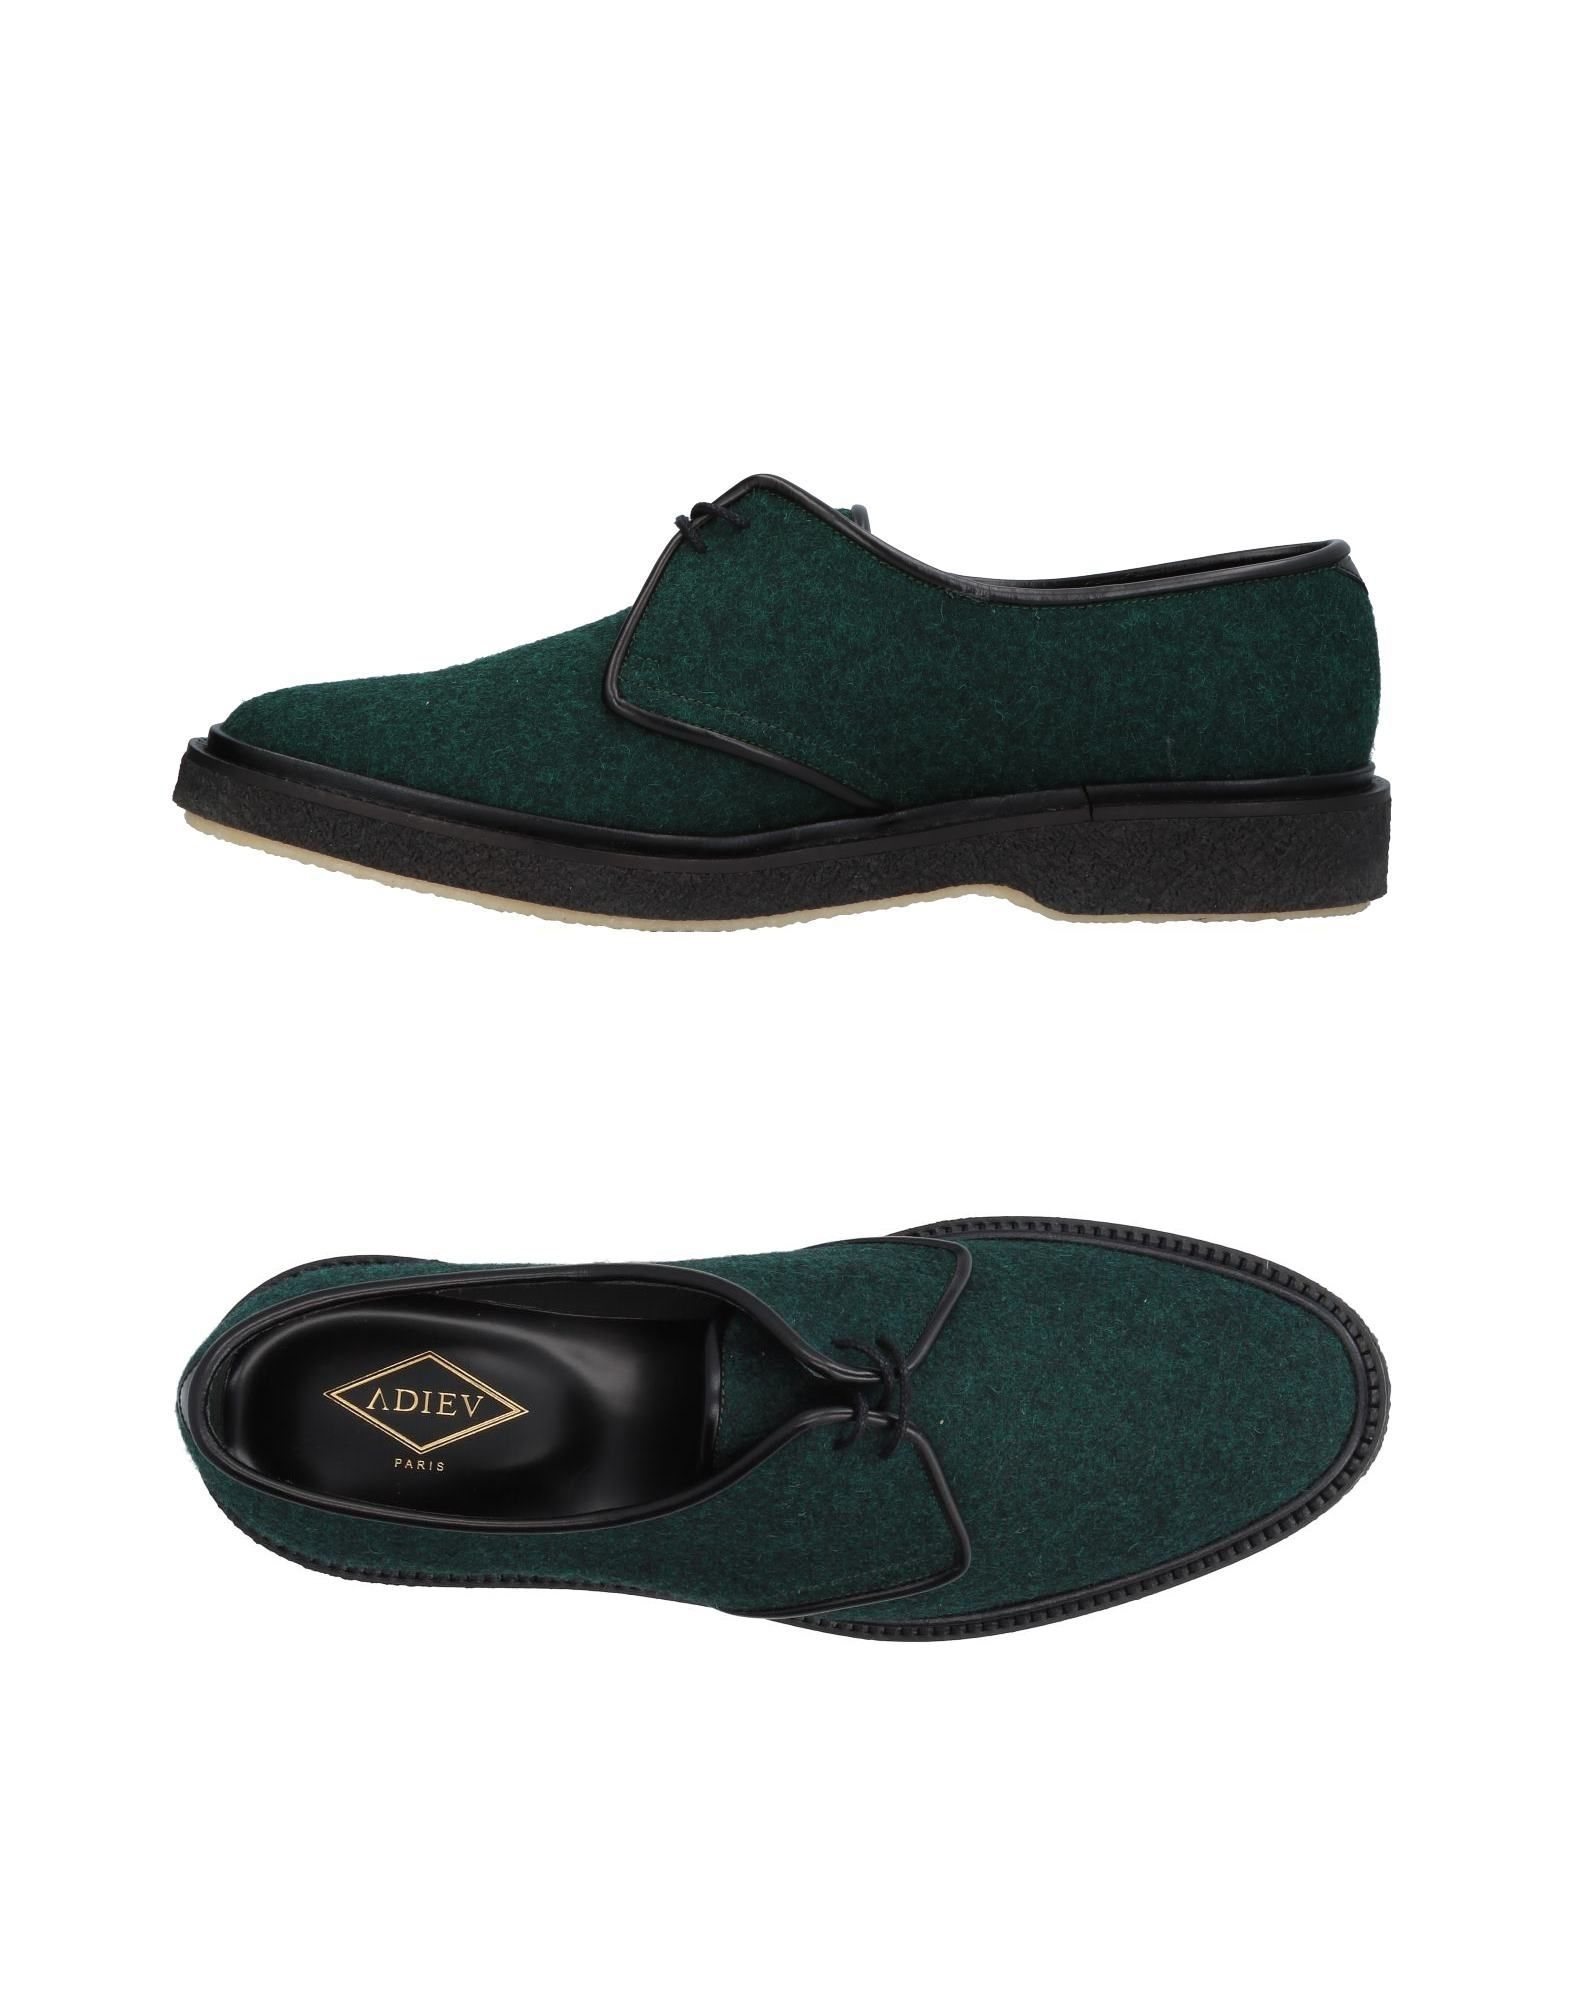 Adieu Schnürschuhe Herren  11391280OE Gute Qualität beliebte Schuhe